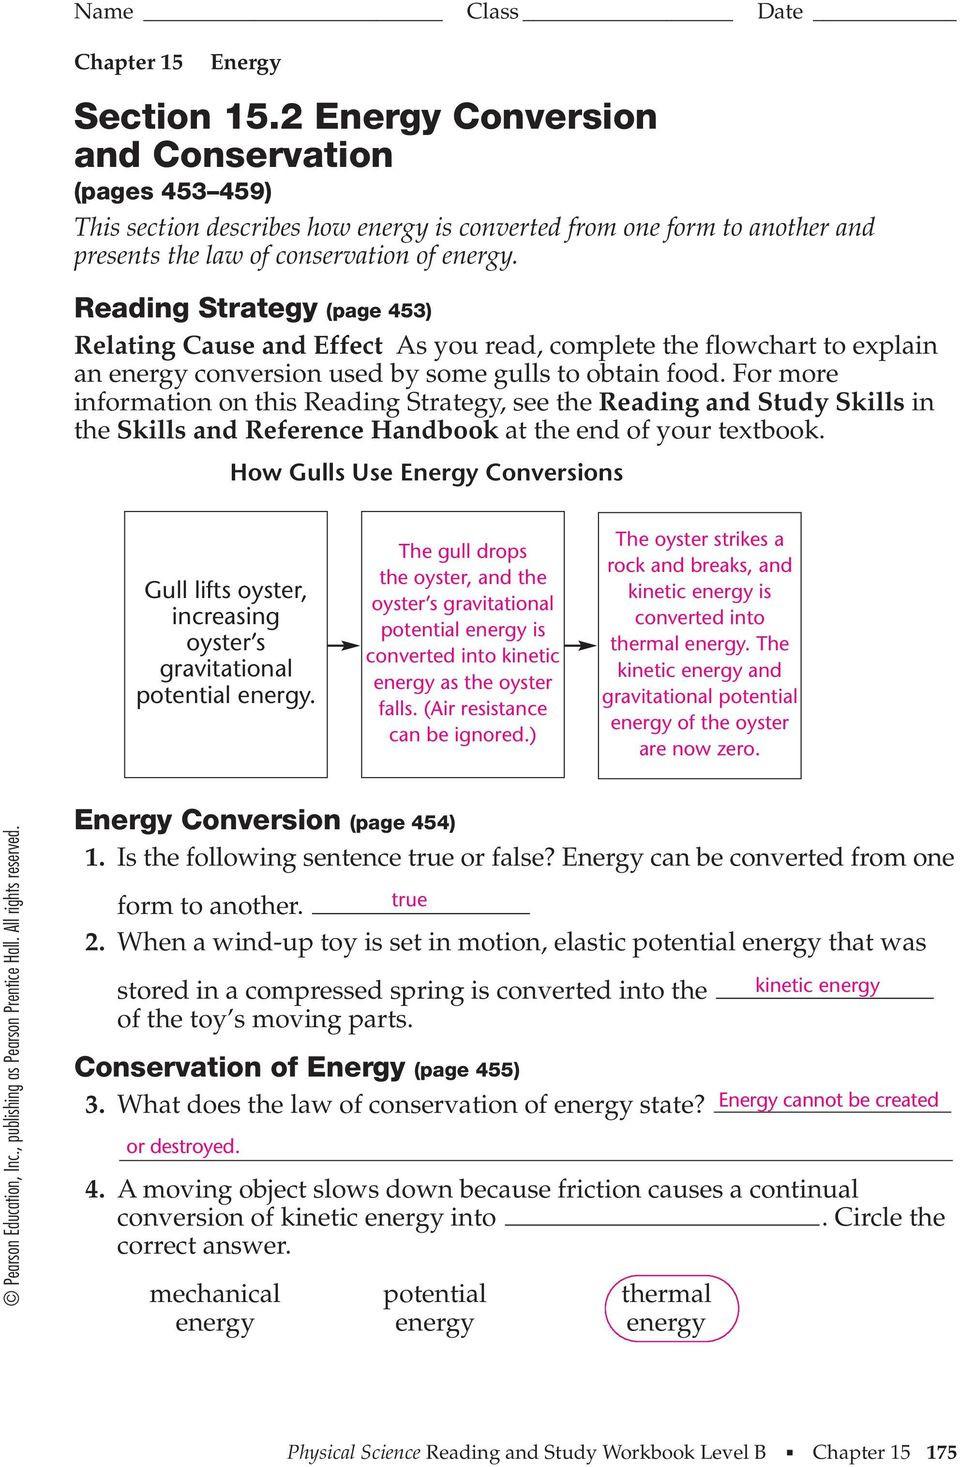 Energy Transformation Worksheet Answers Energy Transformation Worksheet Pdf Energy Etfs